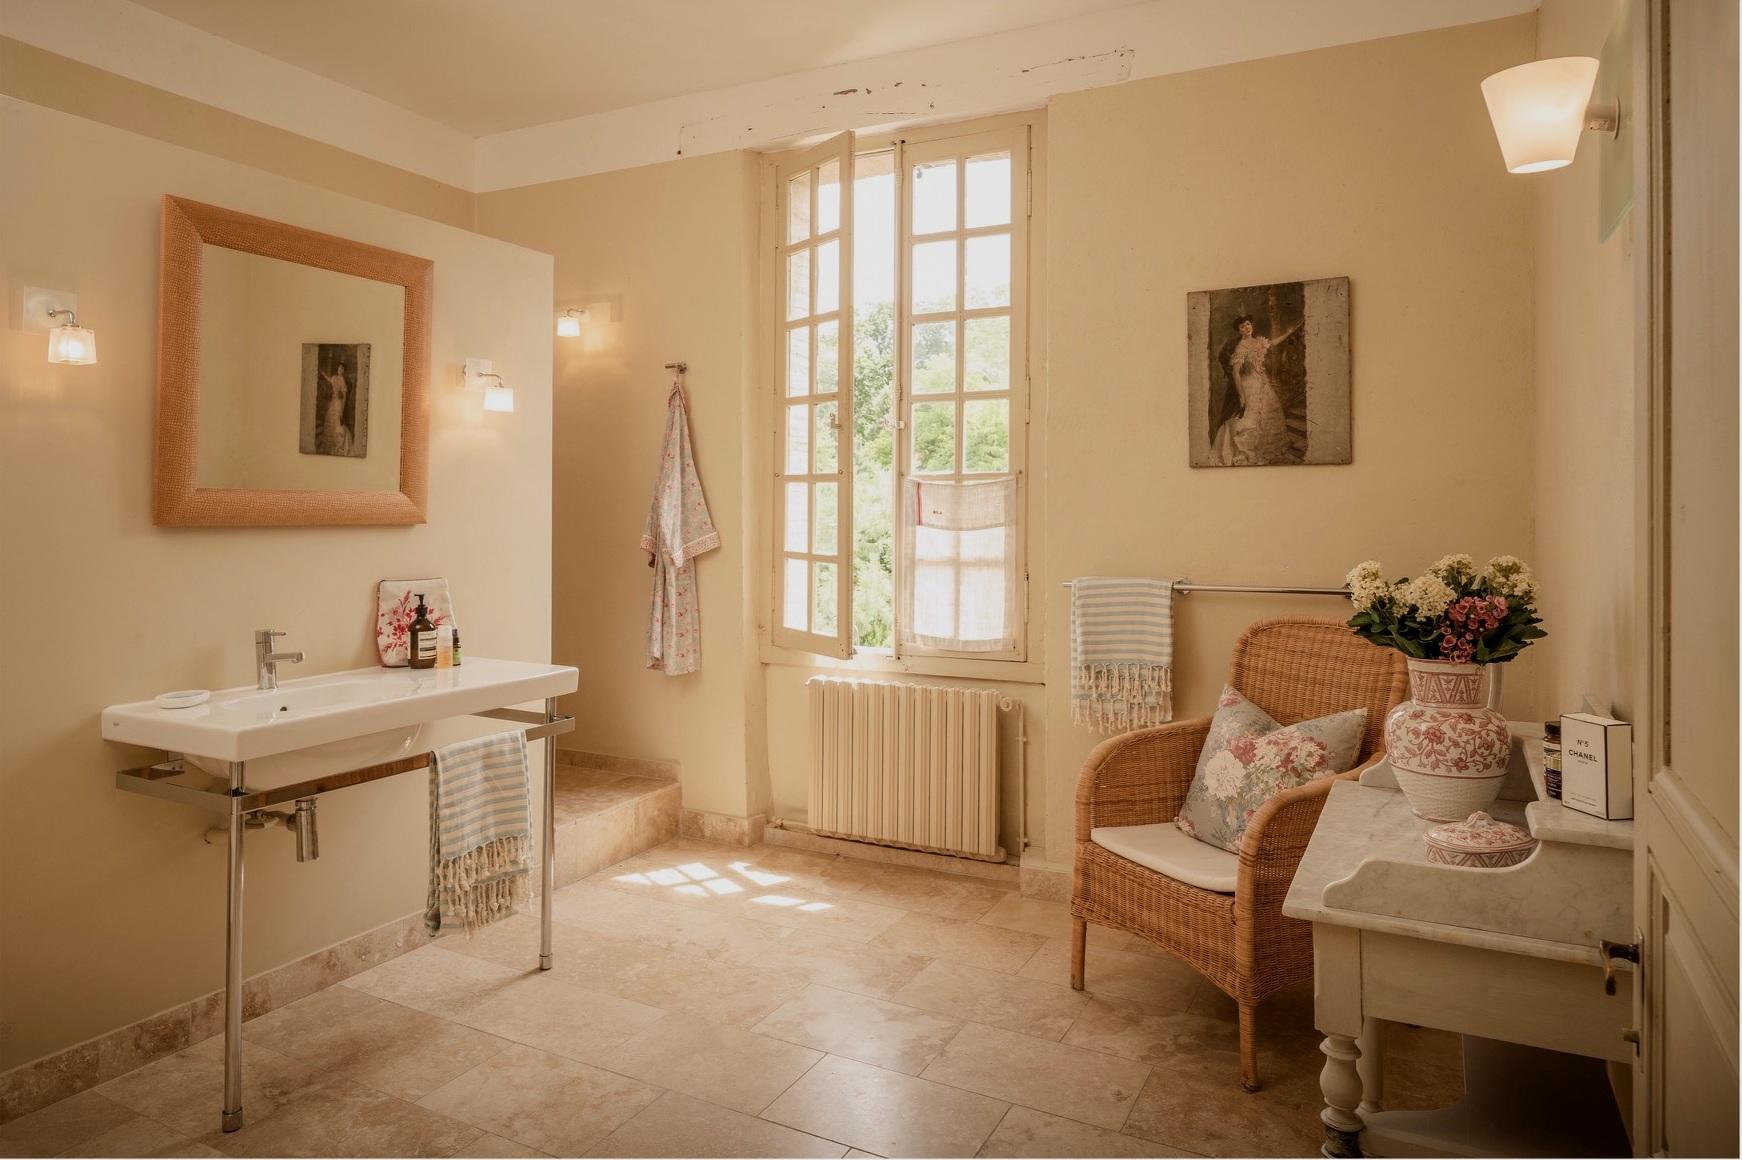 Le Perchoir-montpezatbathroom.JPG